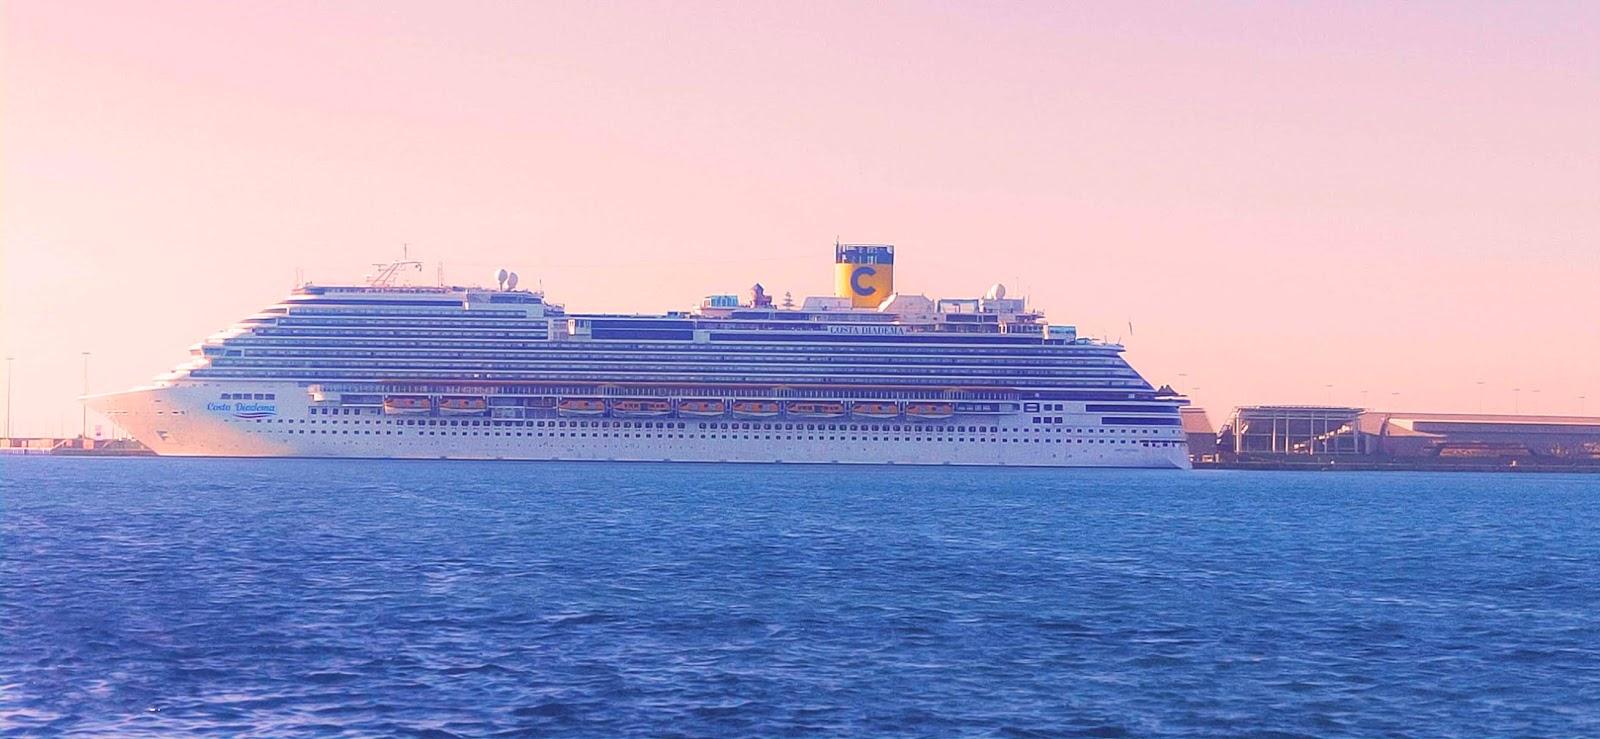 Costa Diadema , carniaval cruises m costa cruises